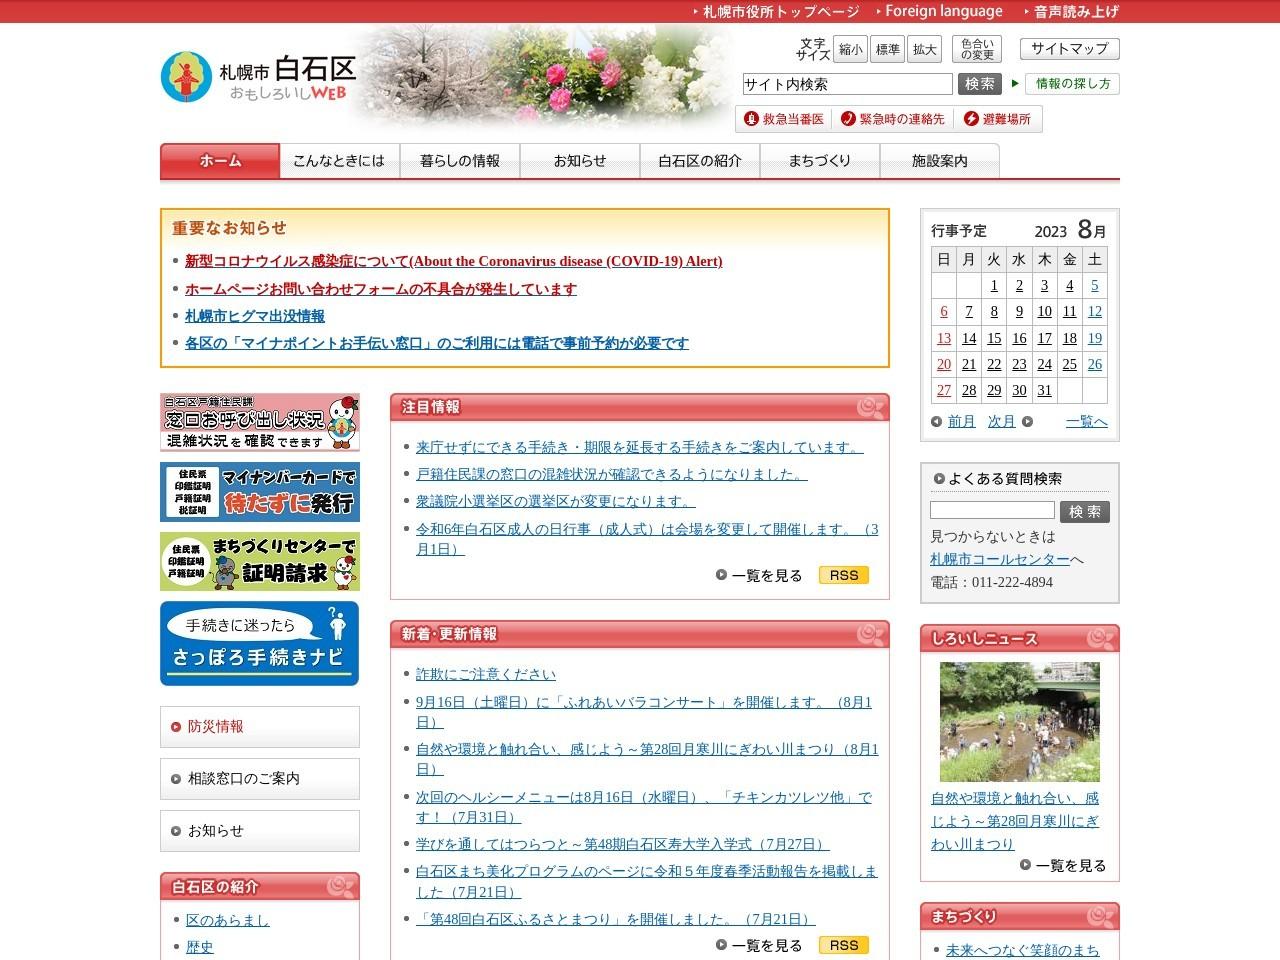 http://www.city.sapporo.jp/shiroishi/